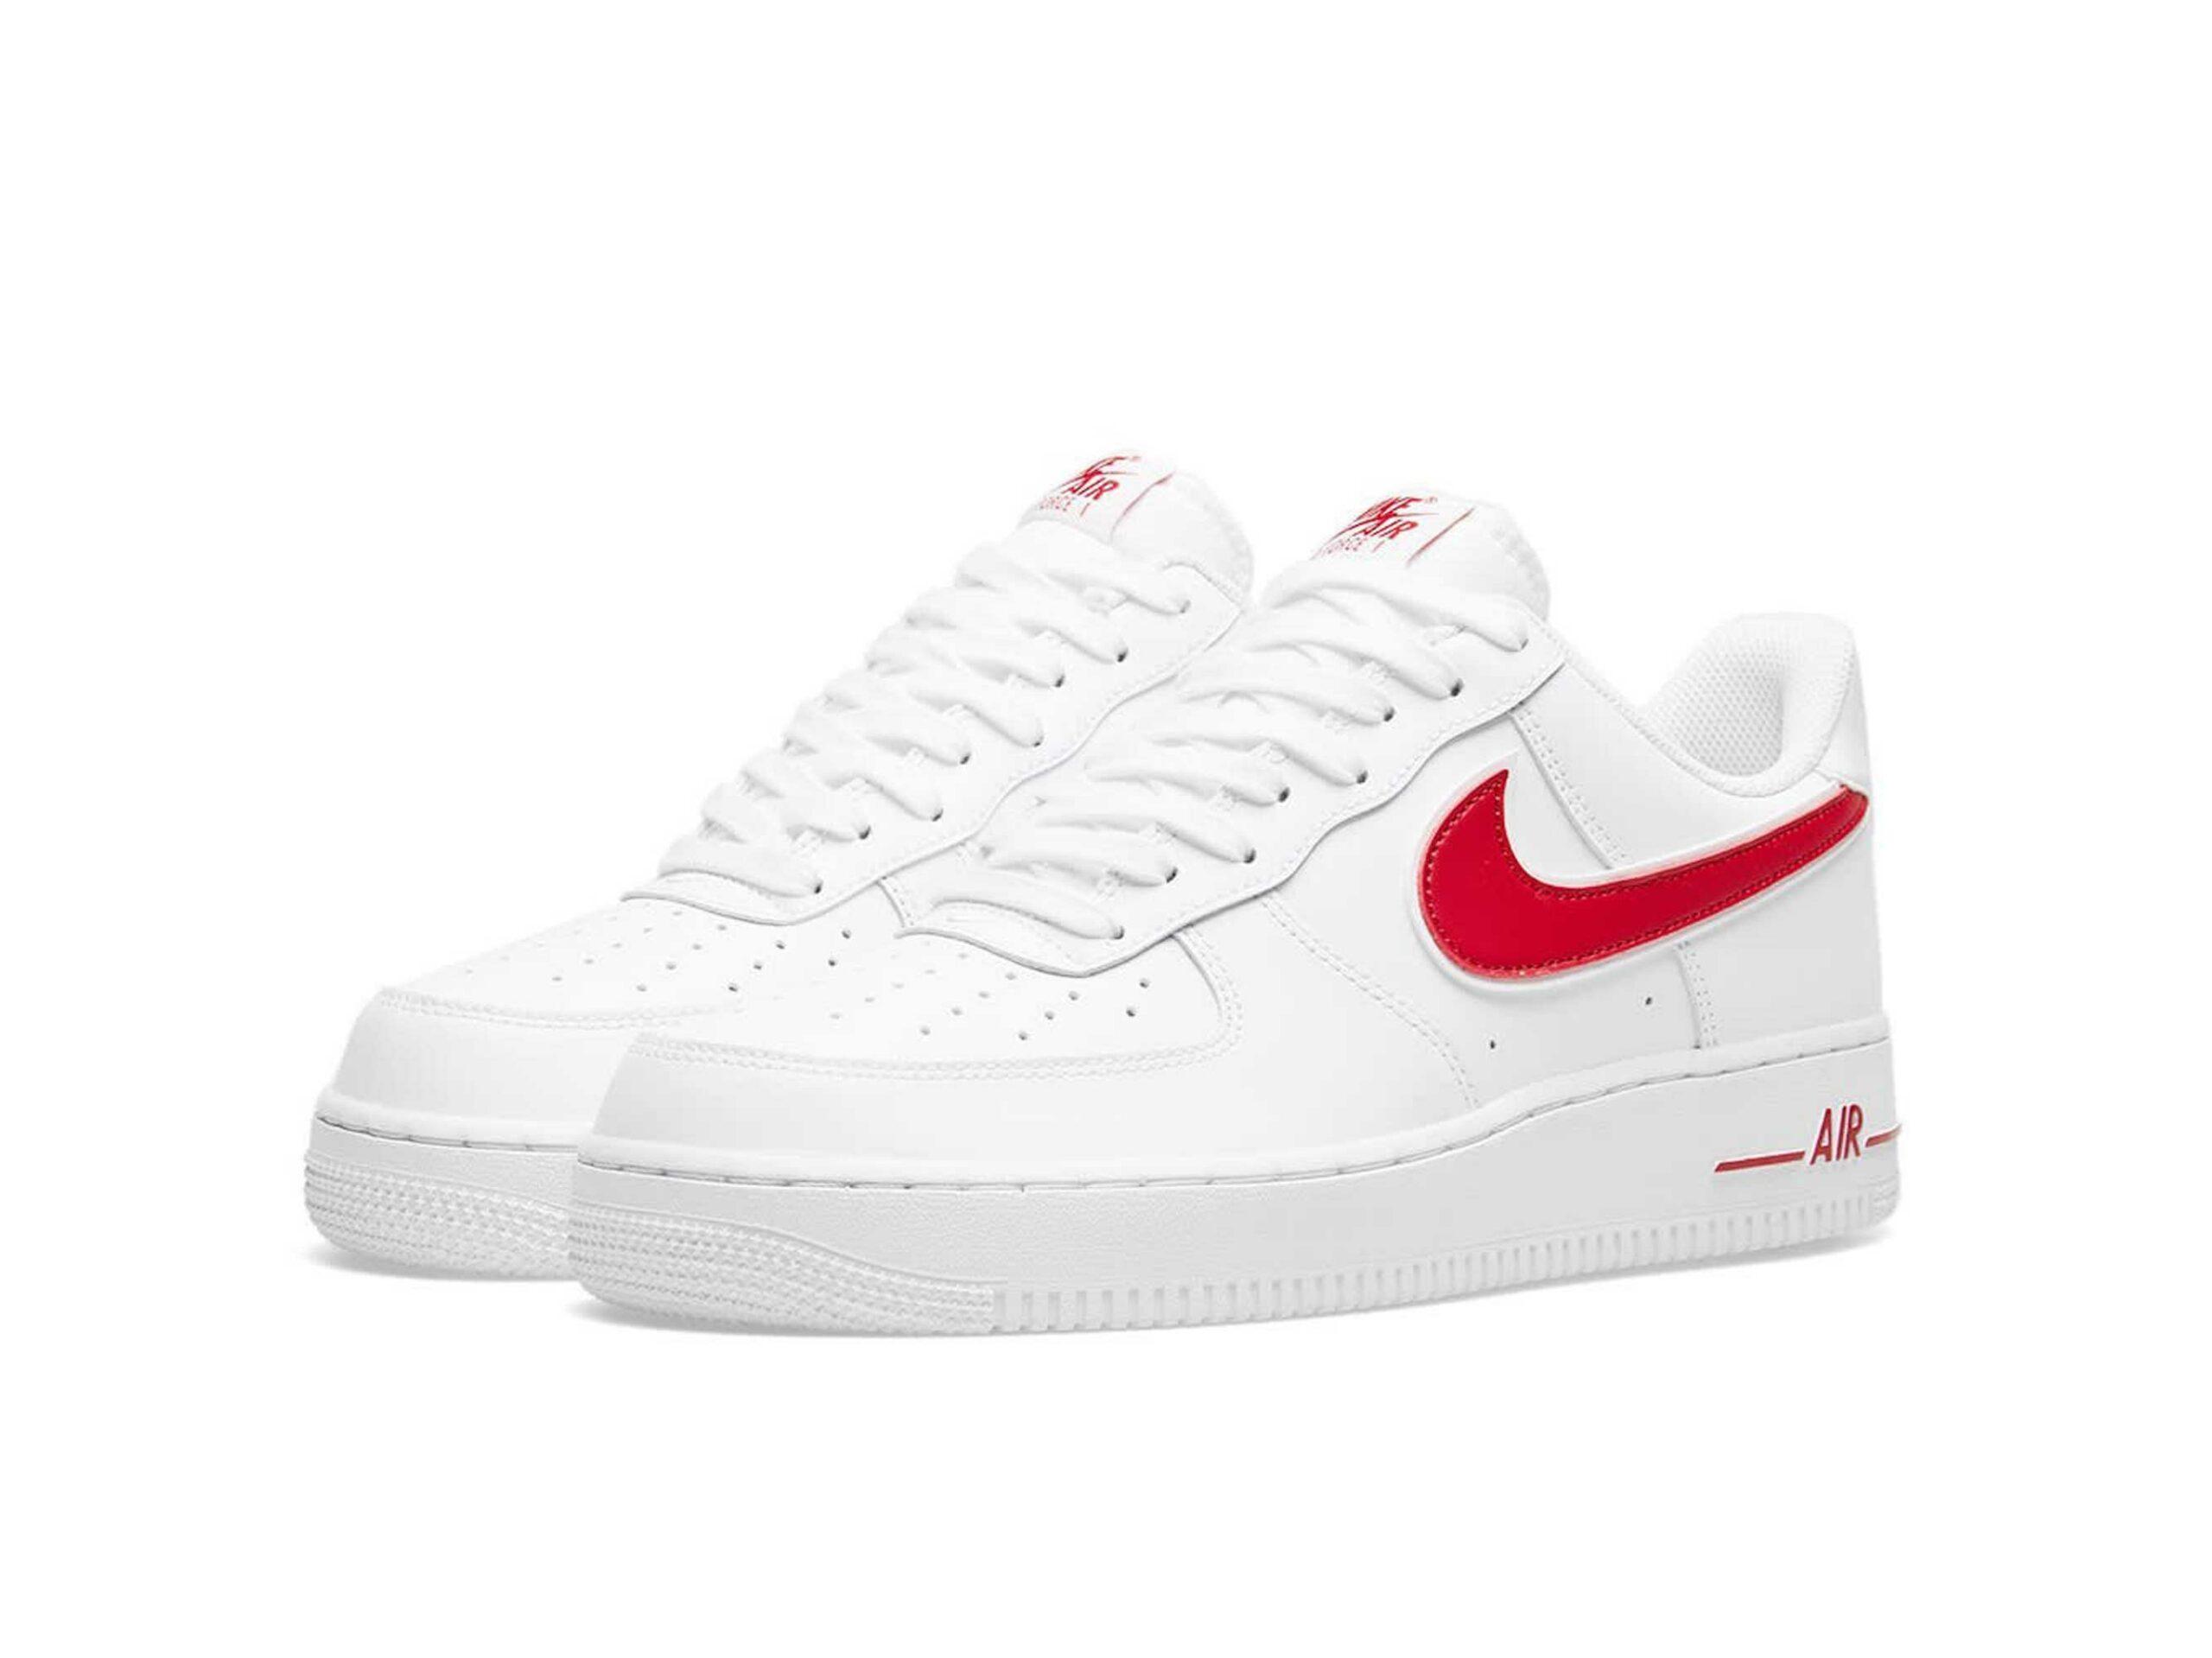 nike air force 1 white red AO2423_102 купить